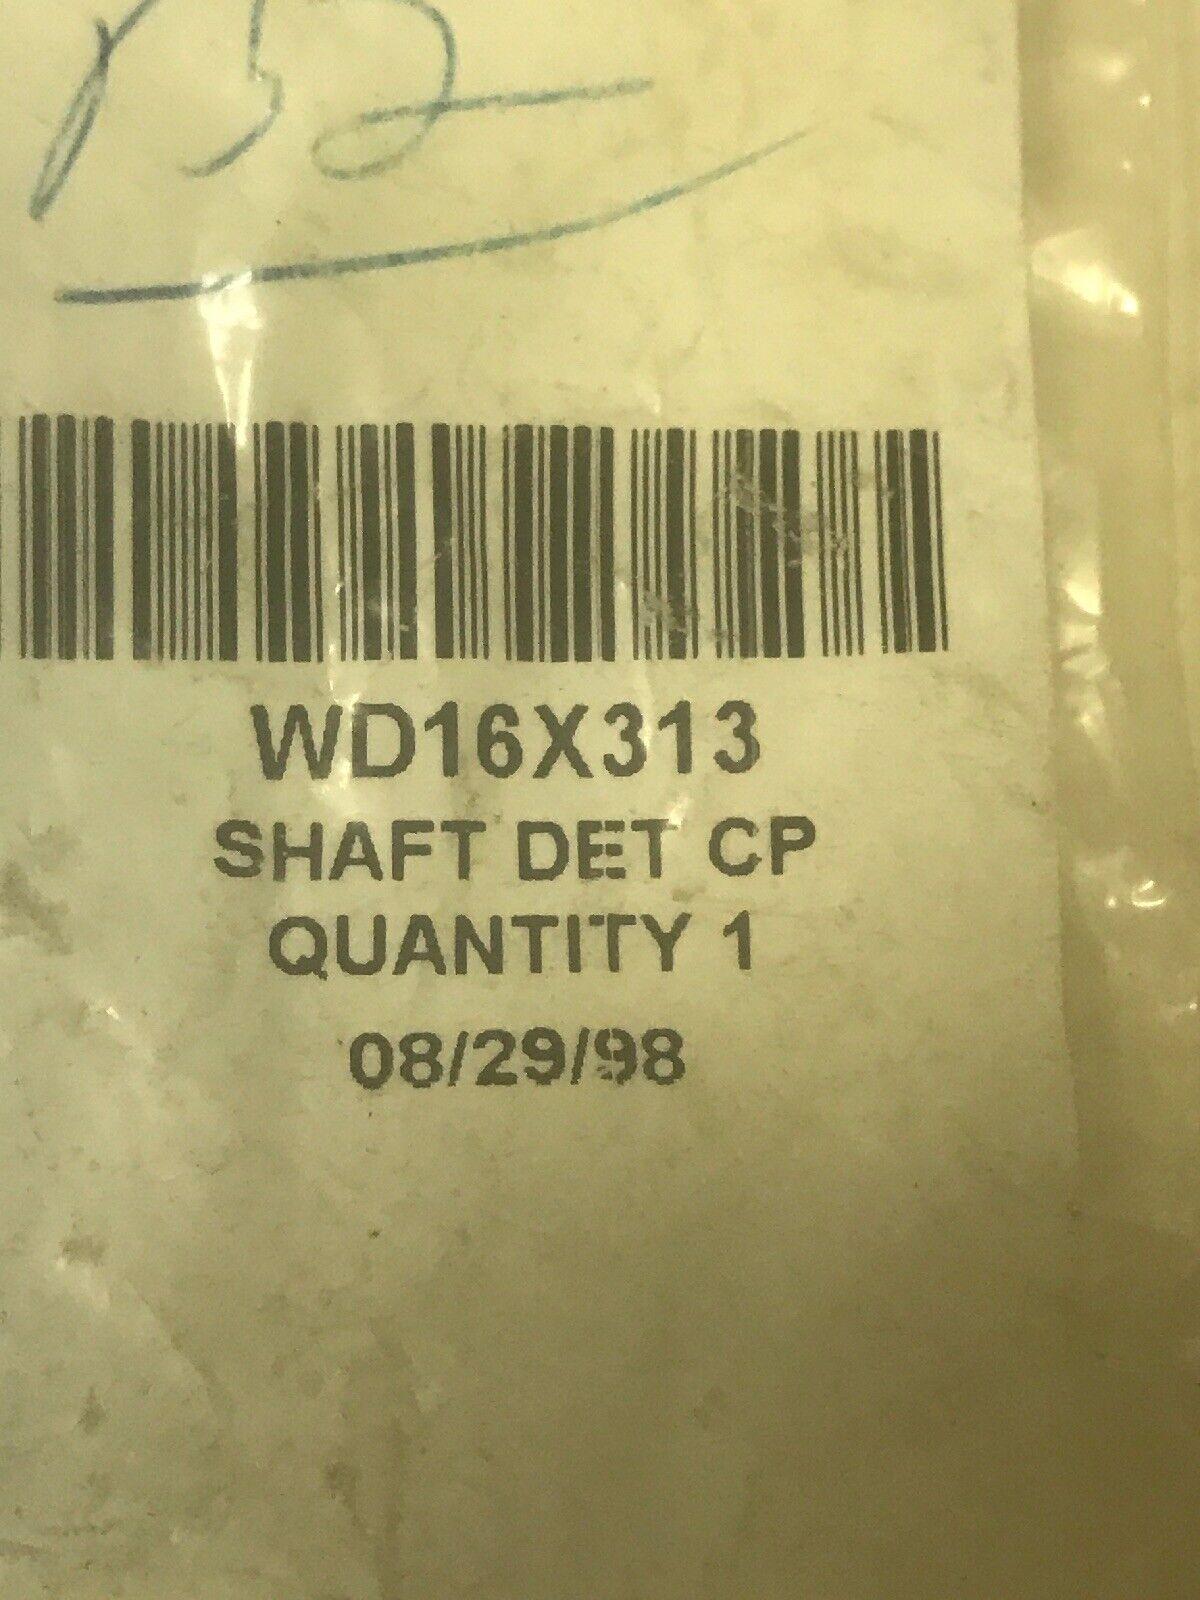 WD16X313 GE Shaft Det Cp Genuine OEM WD16X313